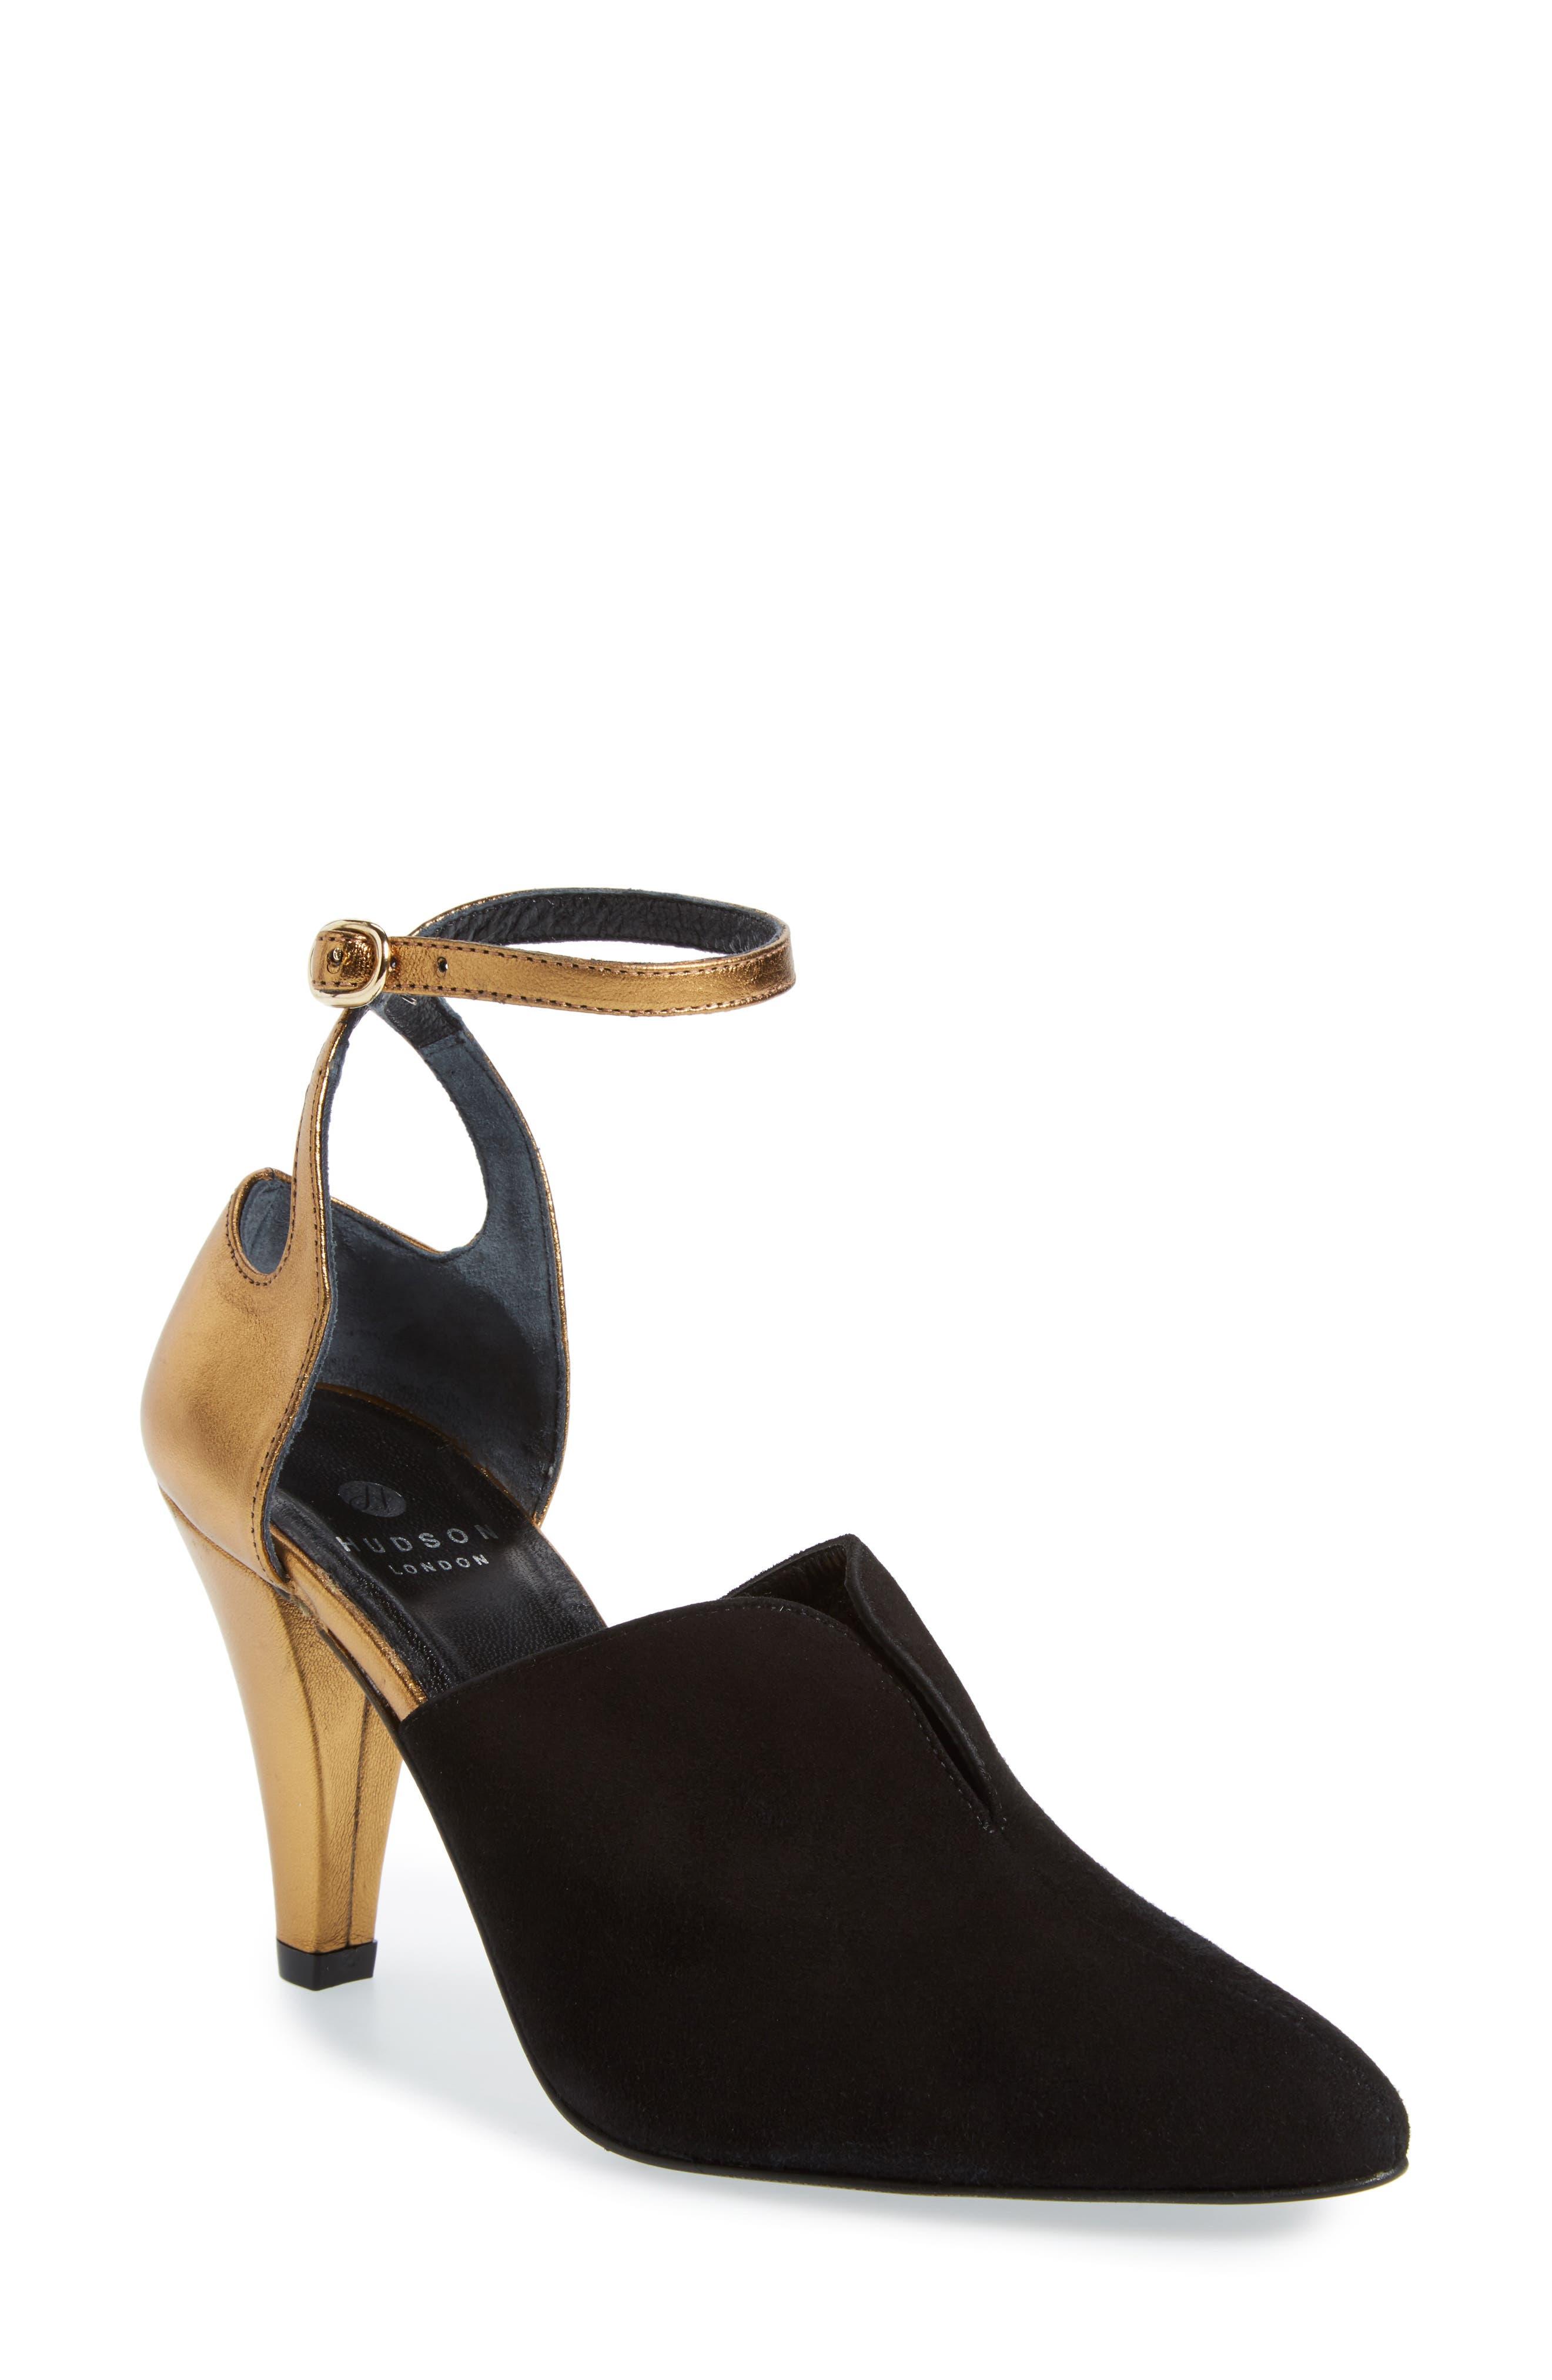 Alternate Image 1 Selected - Hudson London Noreen Ankle Wrap Pump (Women)